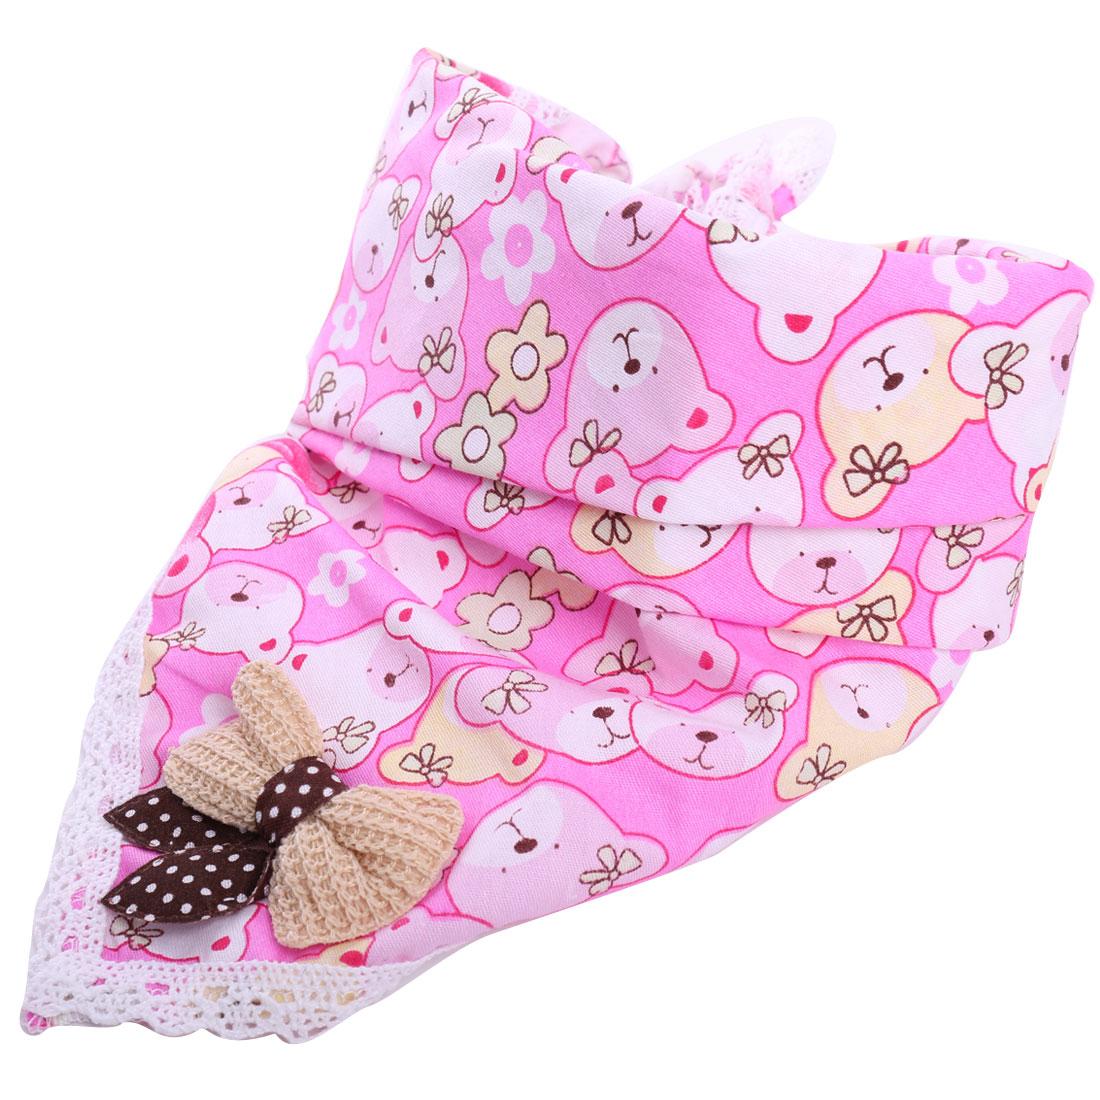 Baby Kids Cute Cartoon Bear Pattern Pink Square Napkins